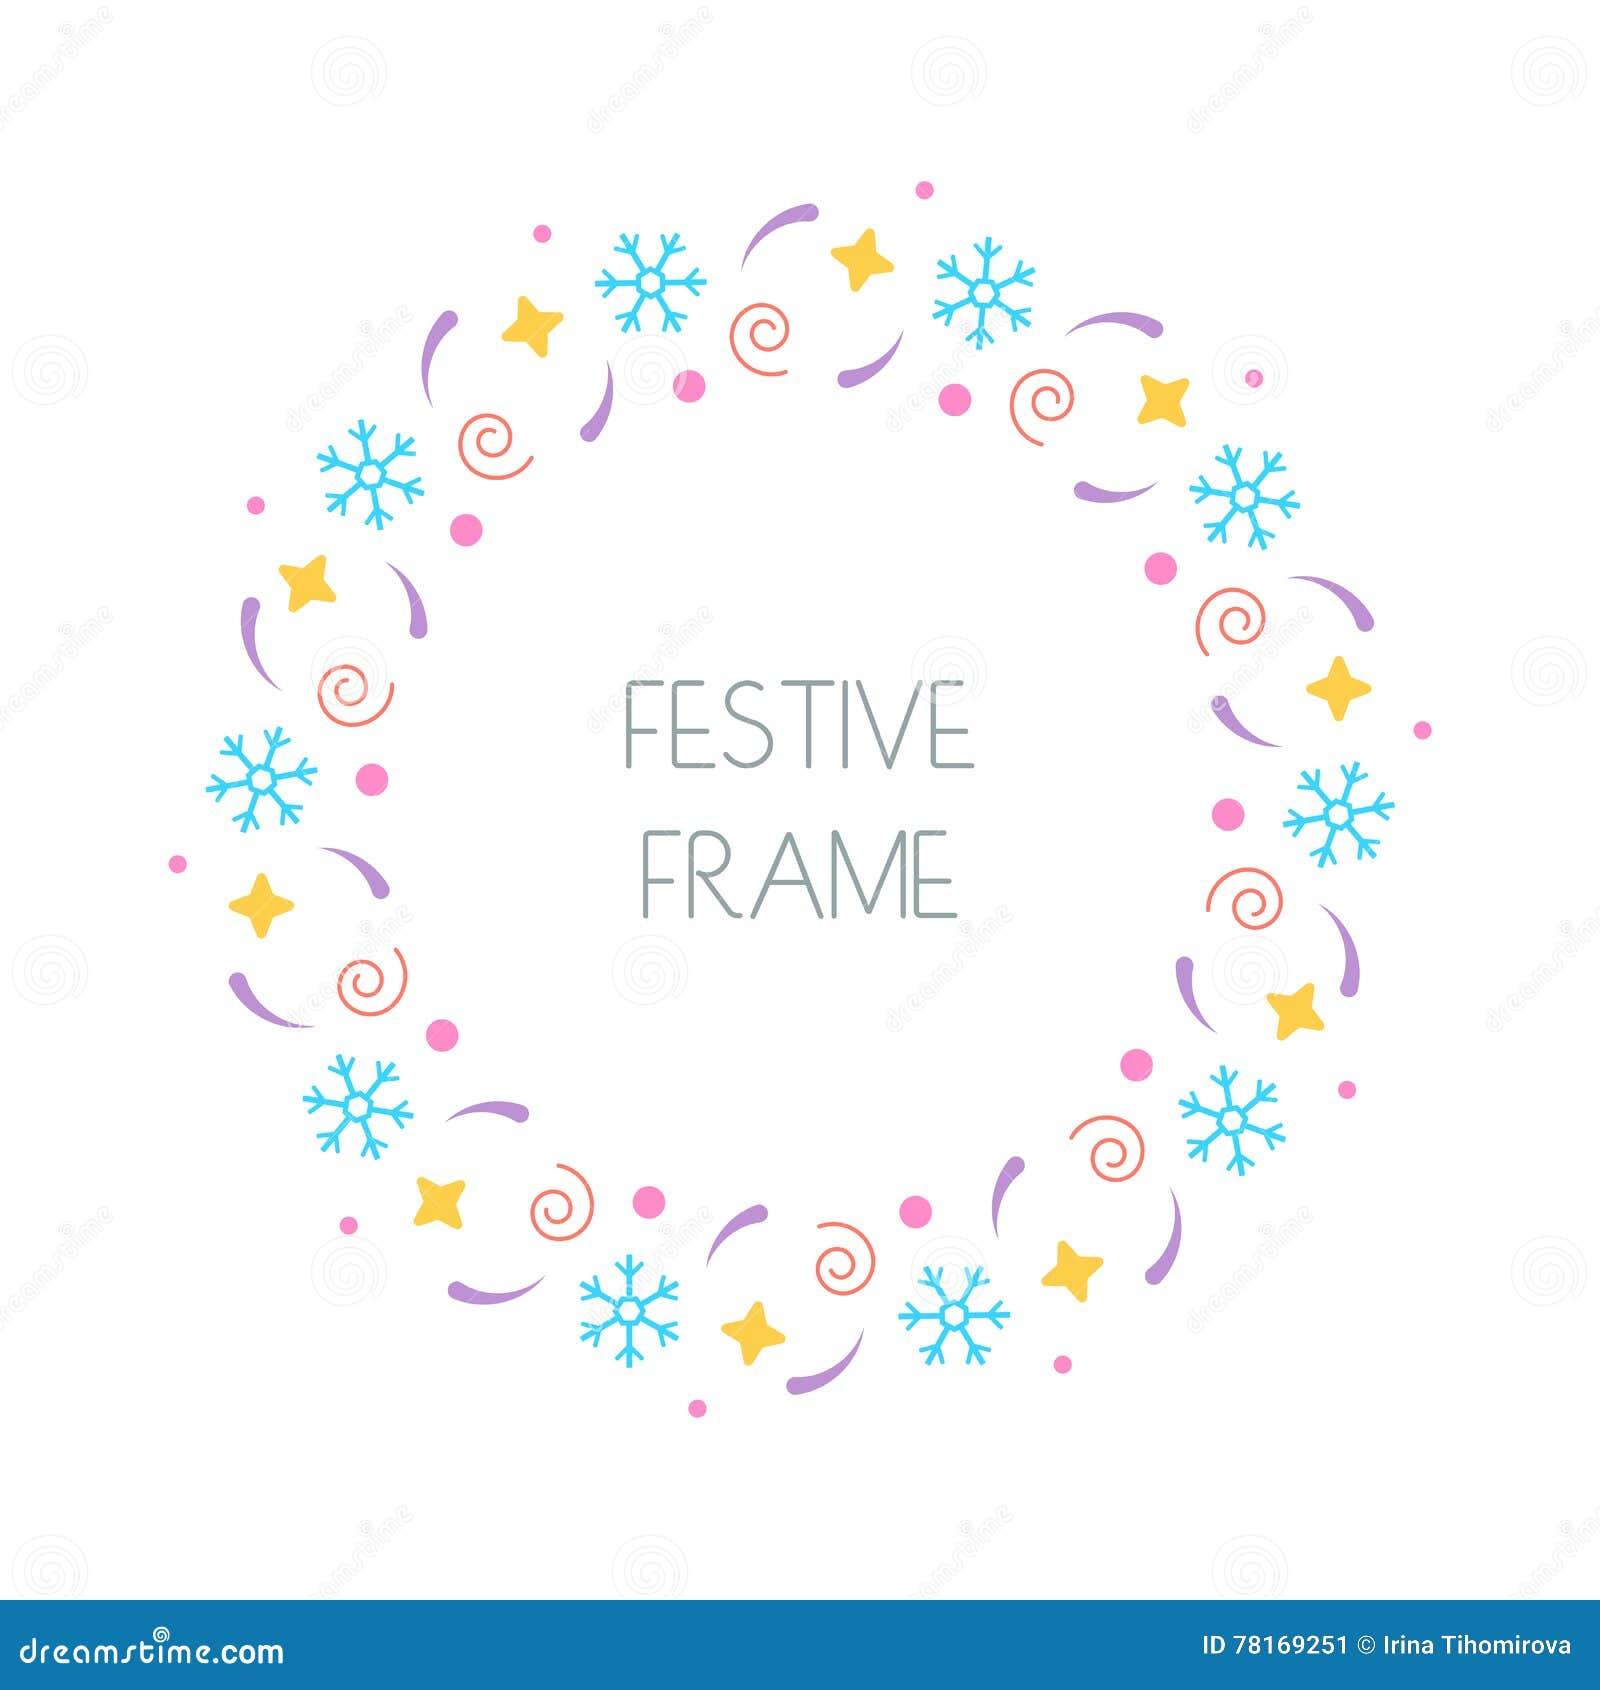 Christmas Festive Round Frame For Christmas Cards, Invitations ...